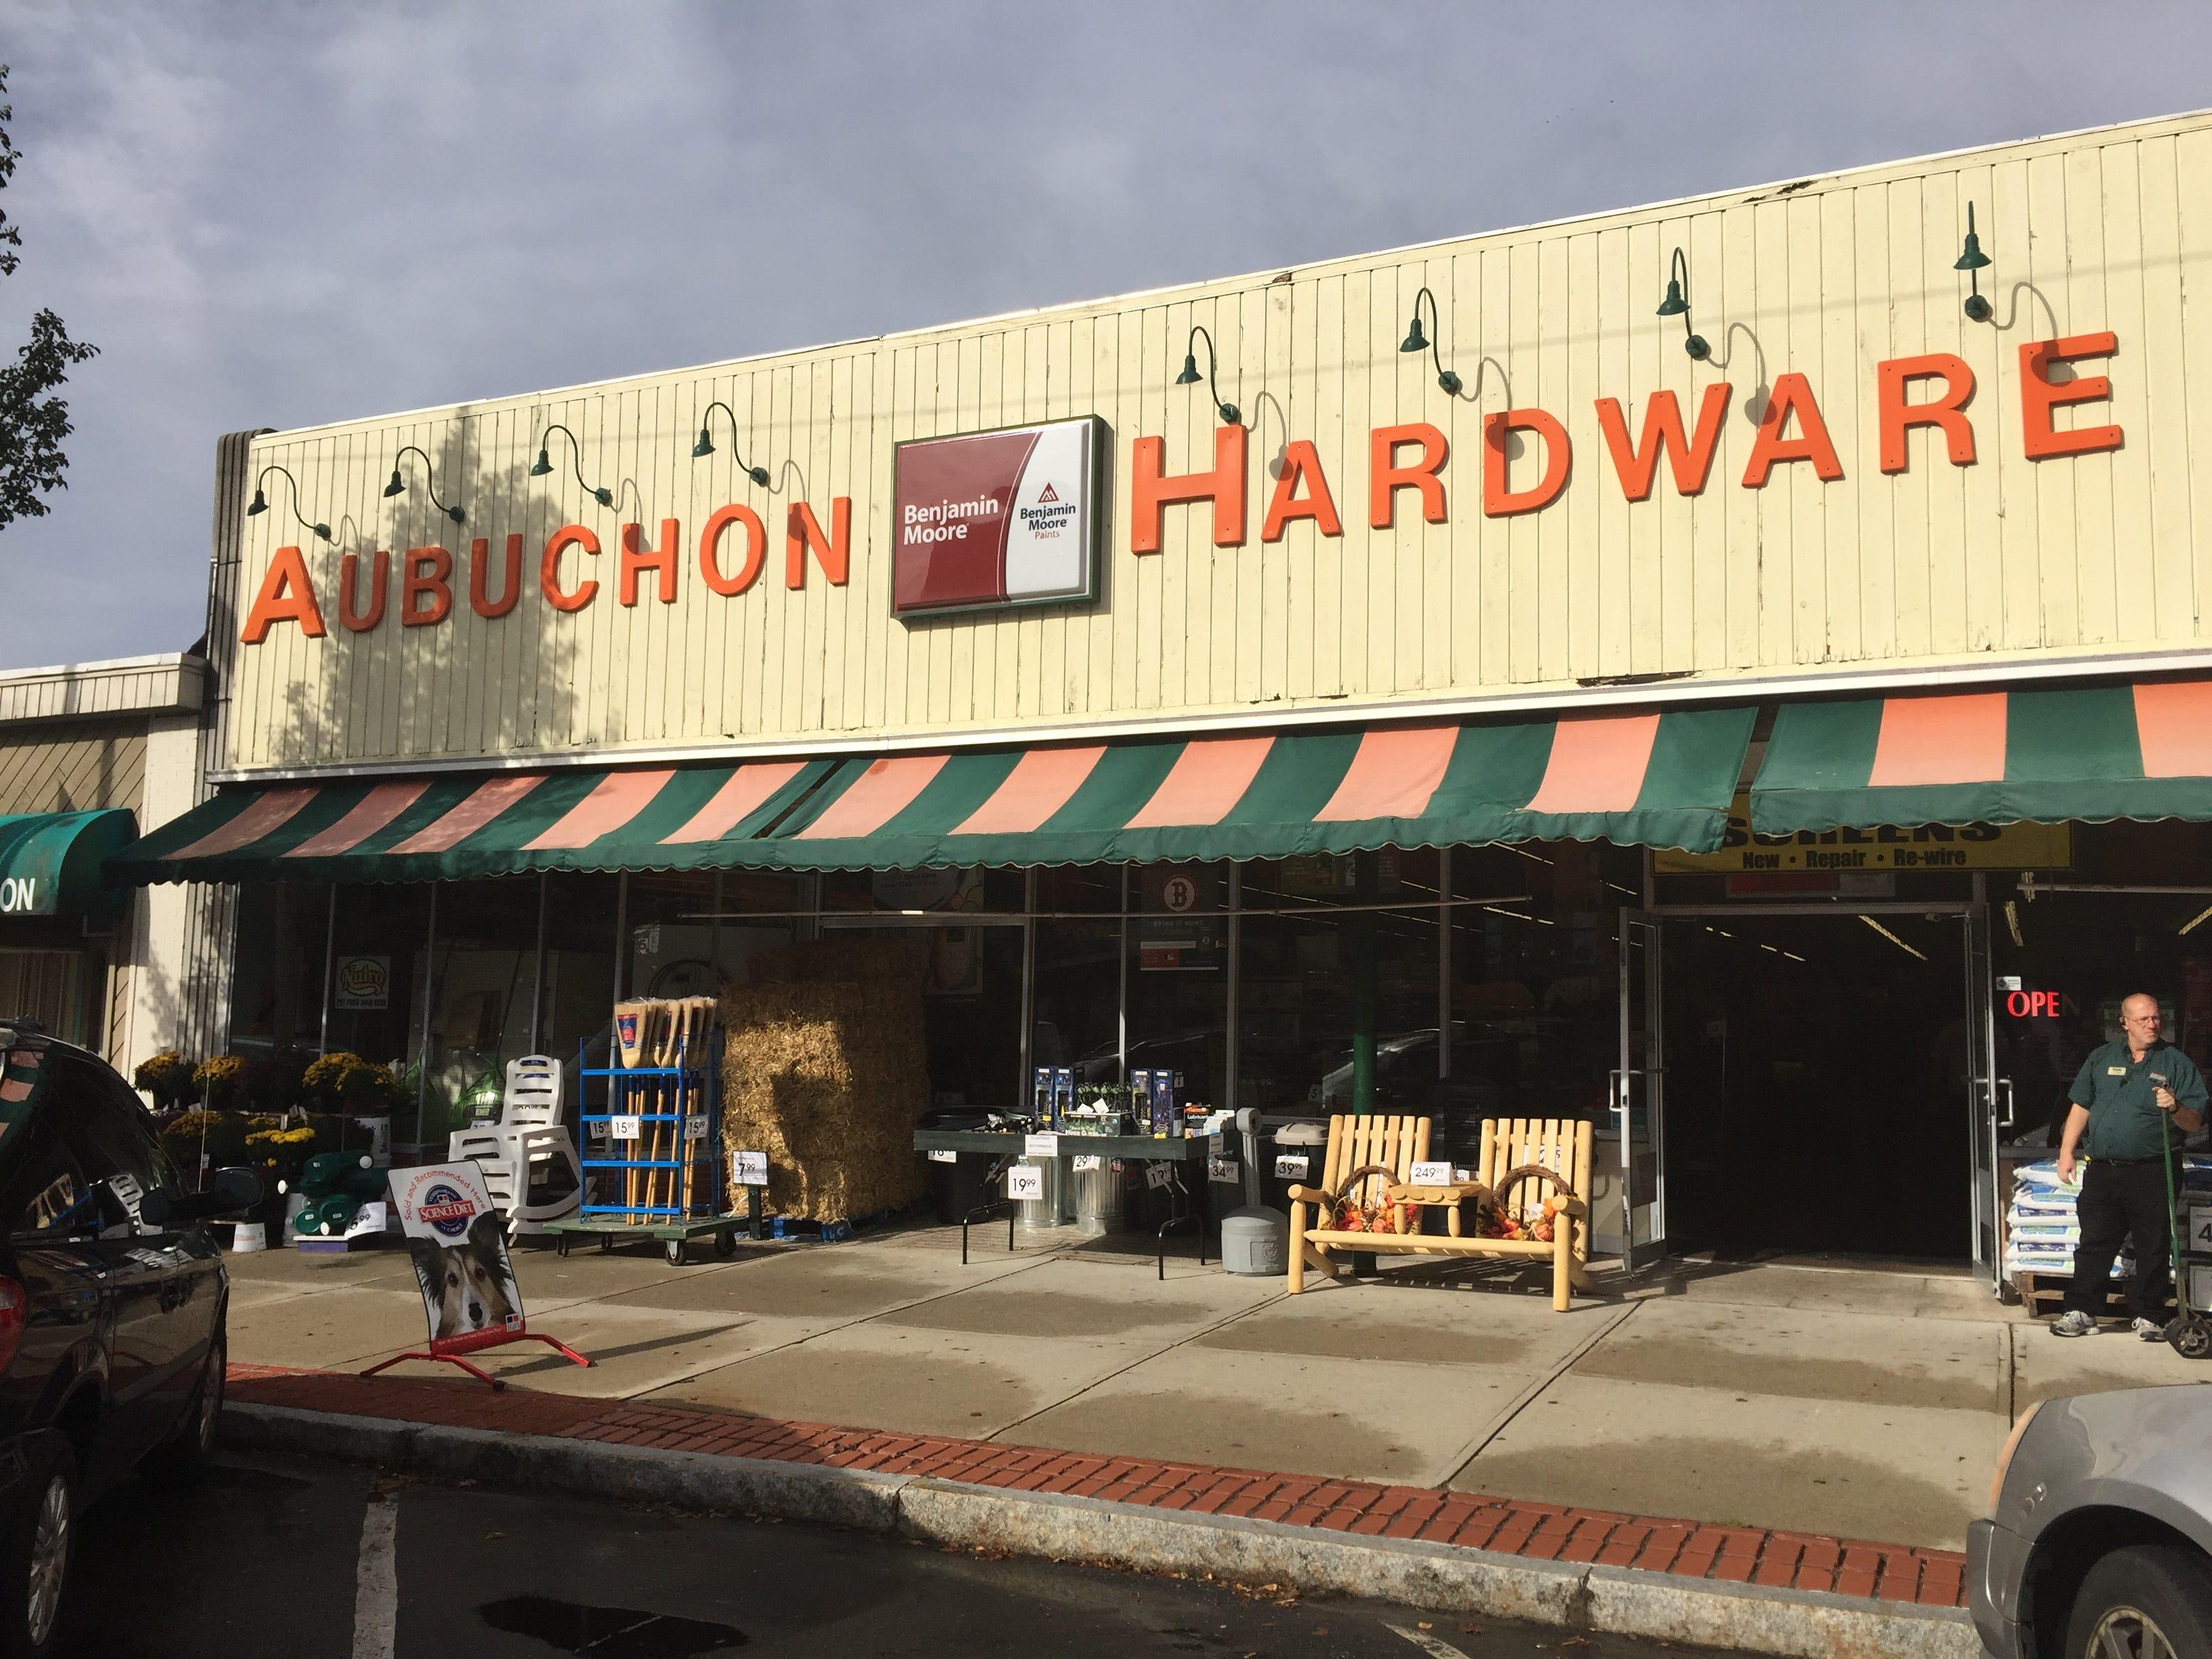 58fbfab55428 Aubuchon Hardware Store Clinton, MA (01510) serving Hudson ...